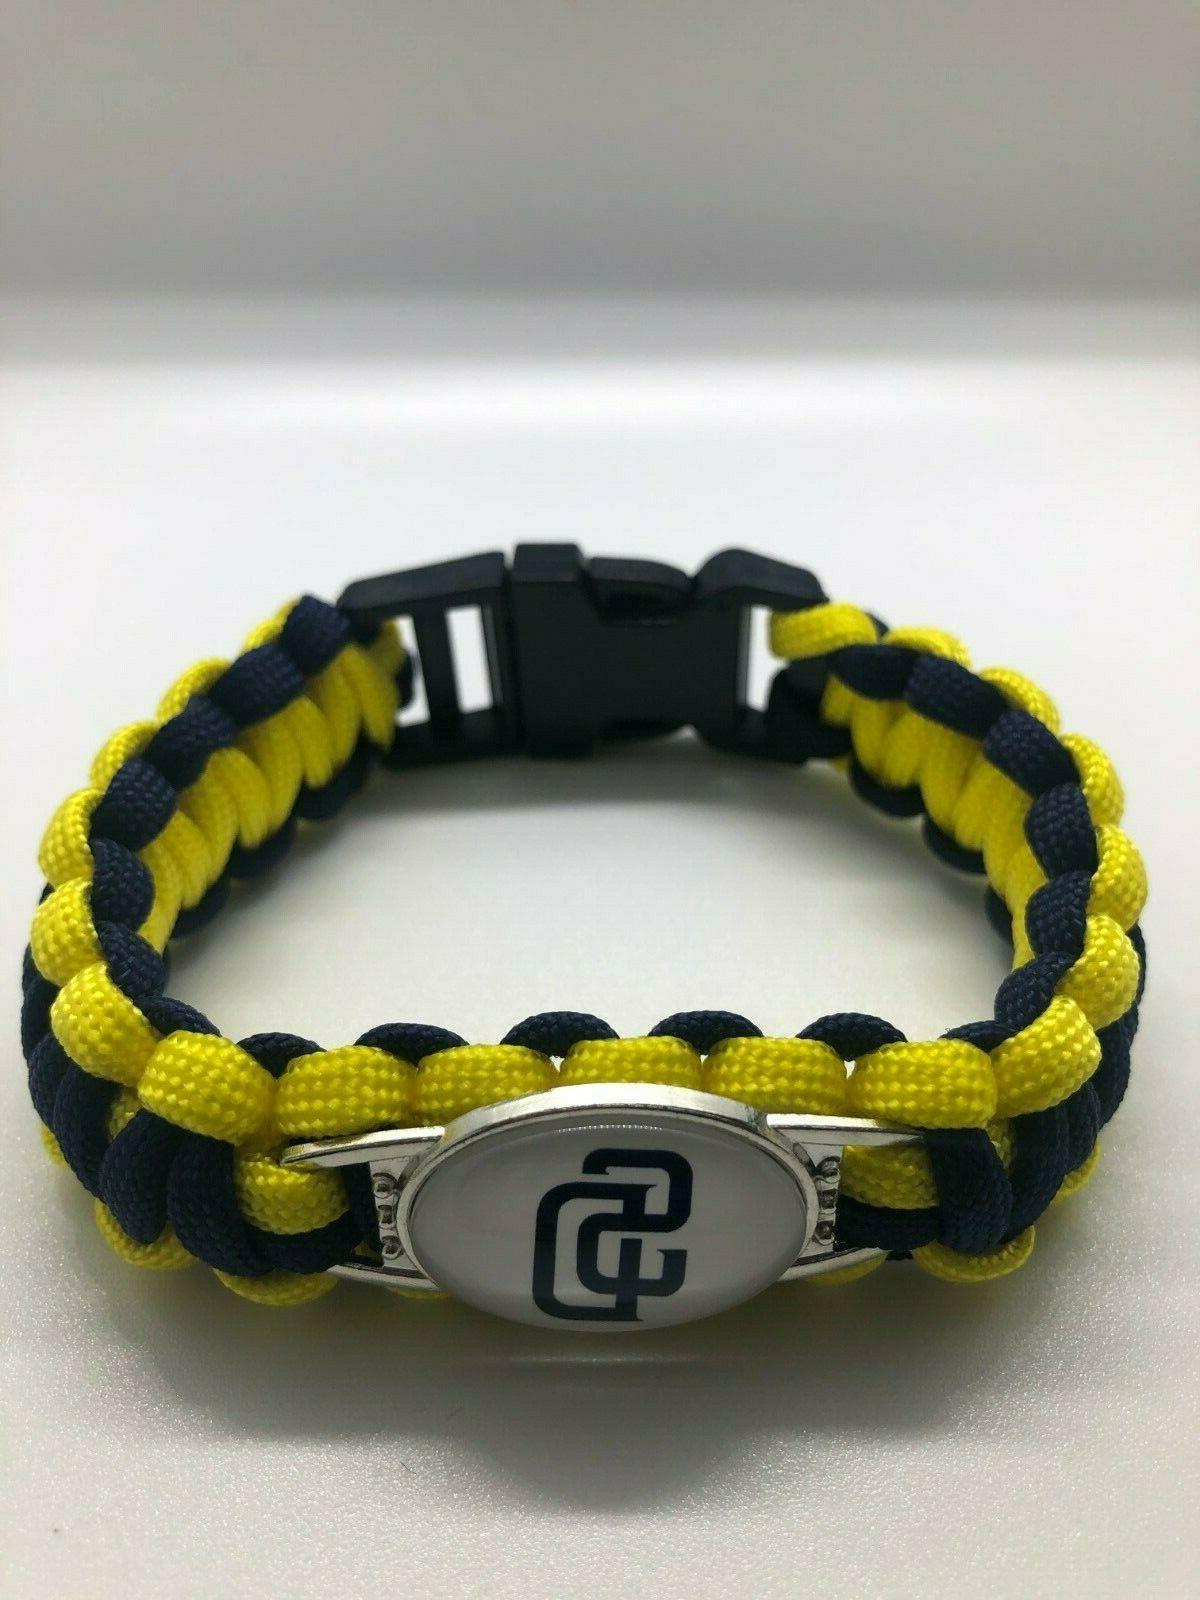 MLB Paracord Bracelet